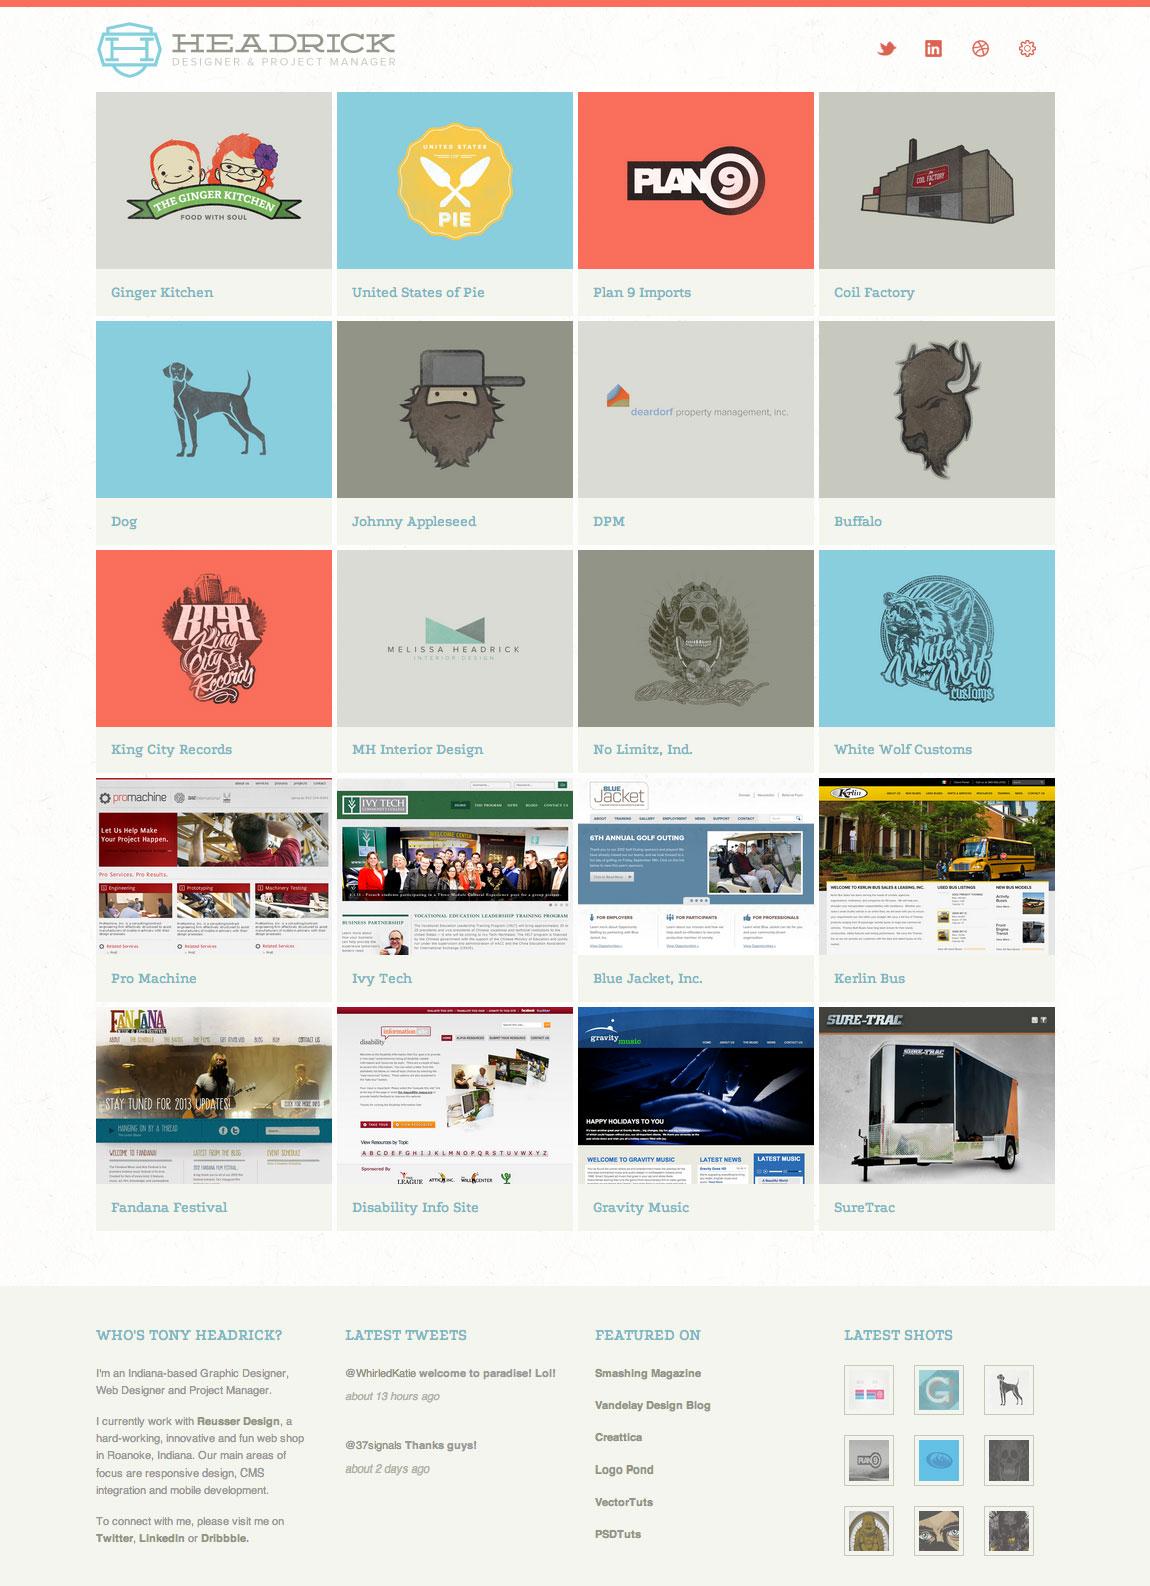 Tony Headrick Website Screenshot